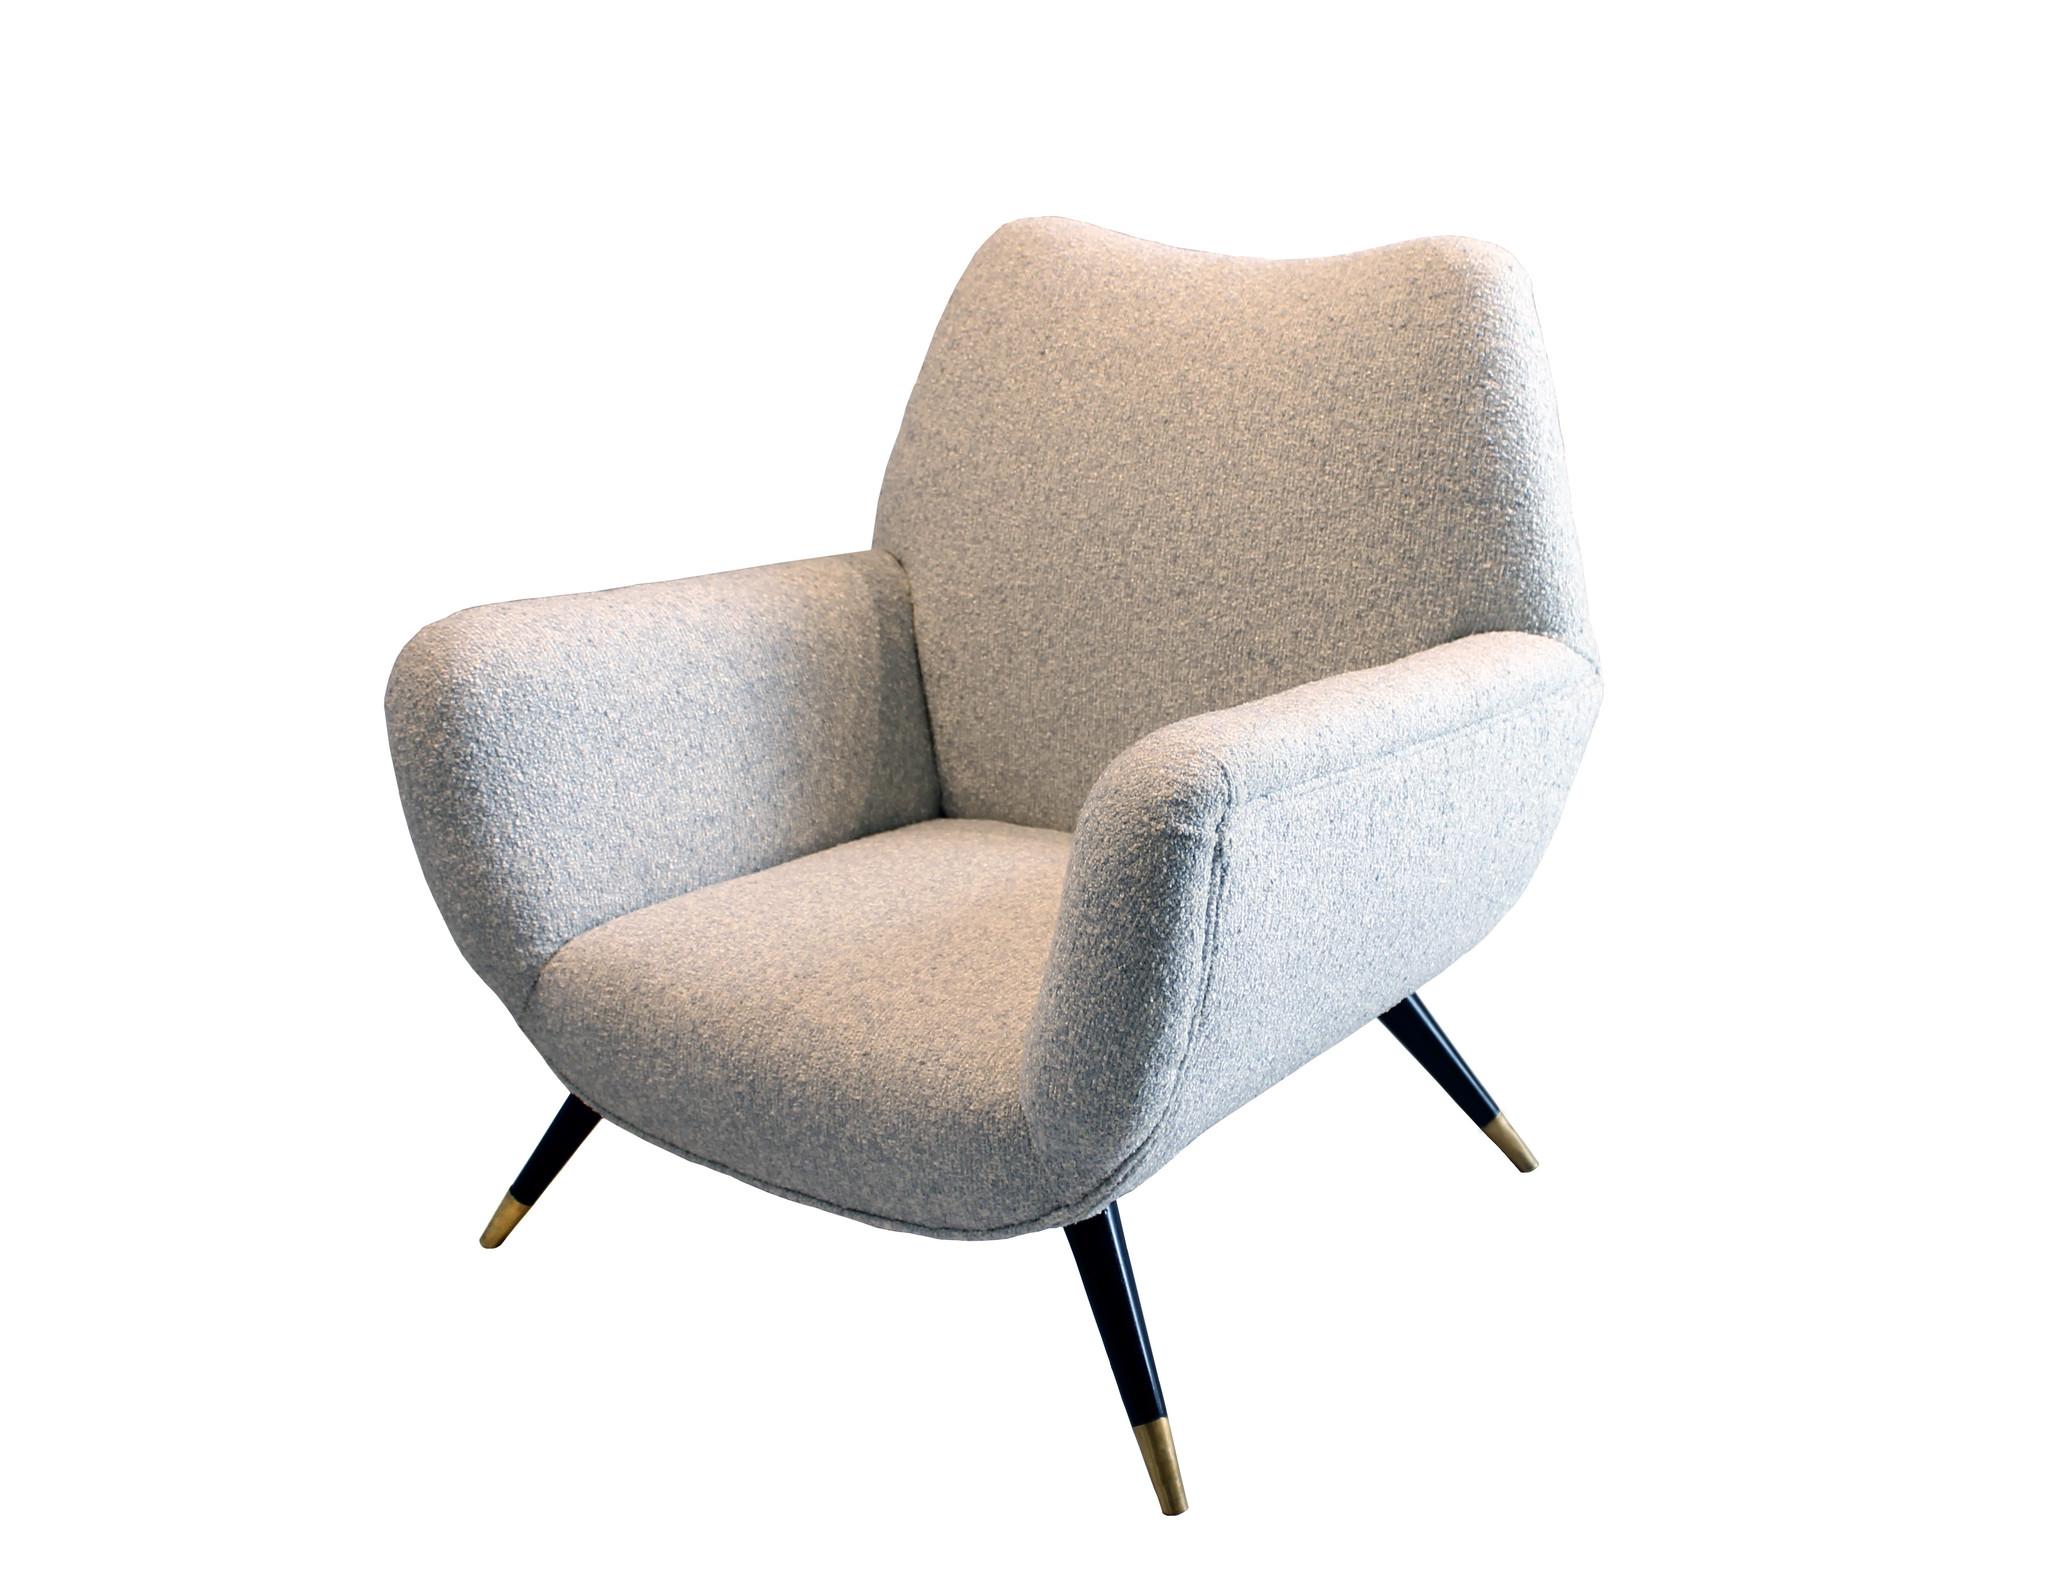 Vintage Pair of Midcentury Italian Upholstered Club Chairs